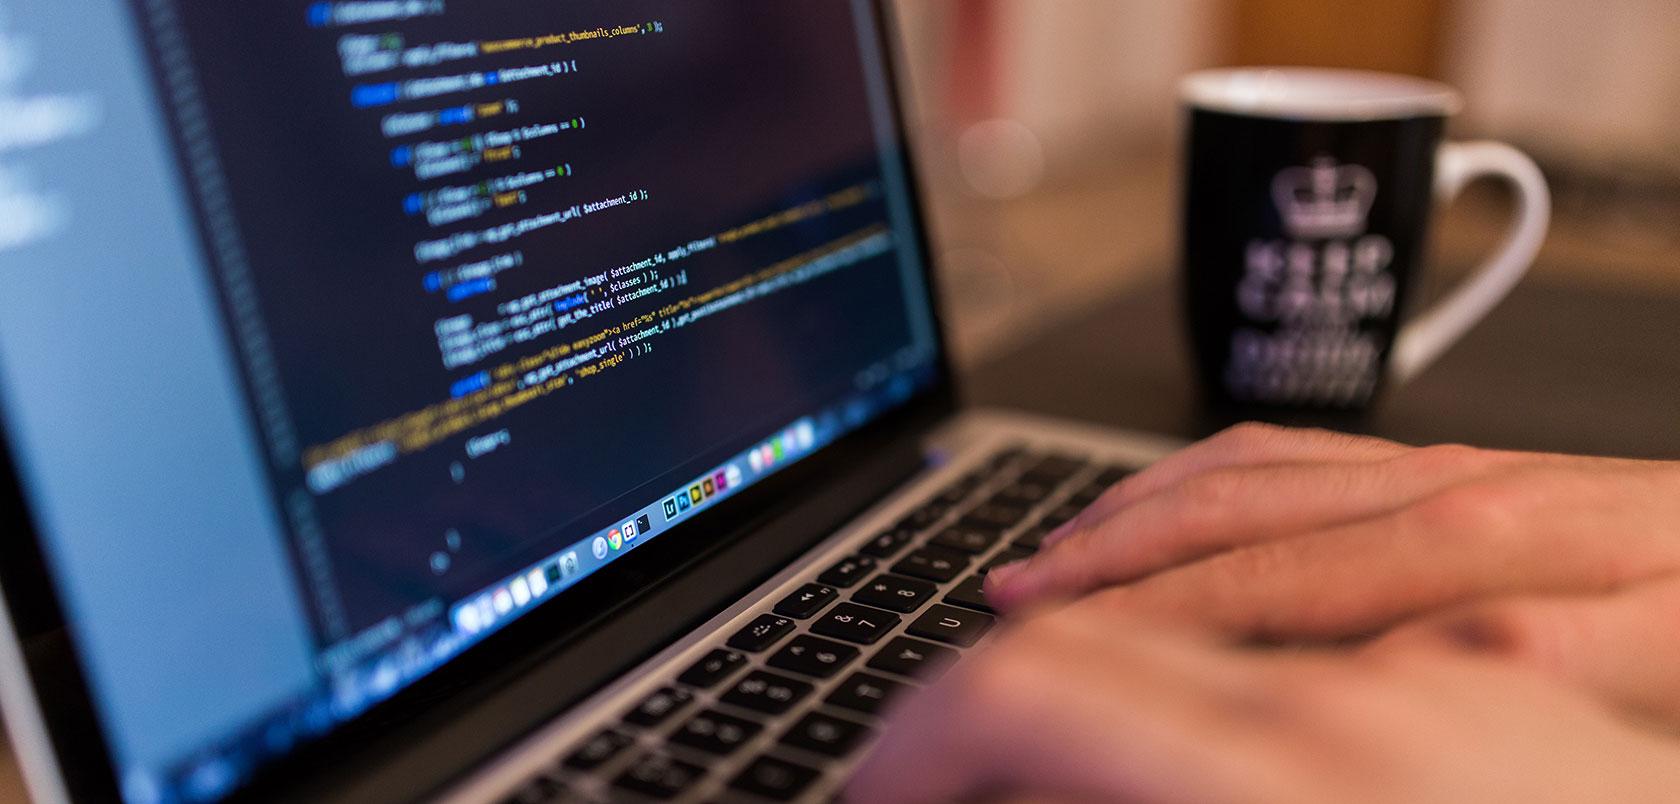 Launch your online biz tomorrow, Here's How (WEBINAR REPLAY)